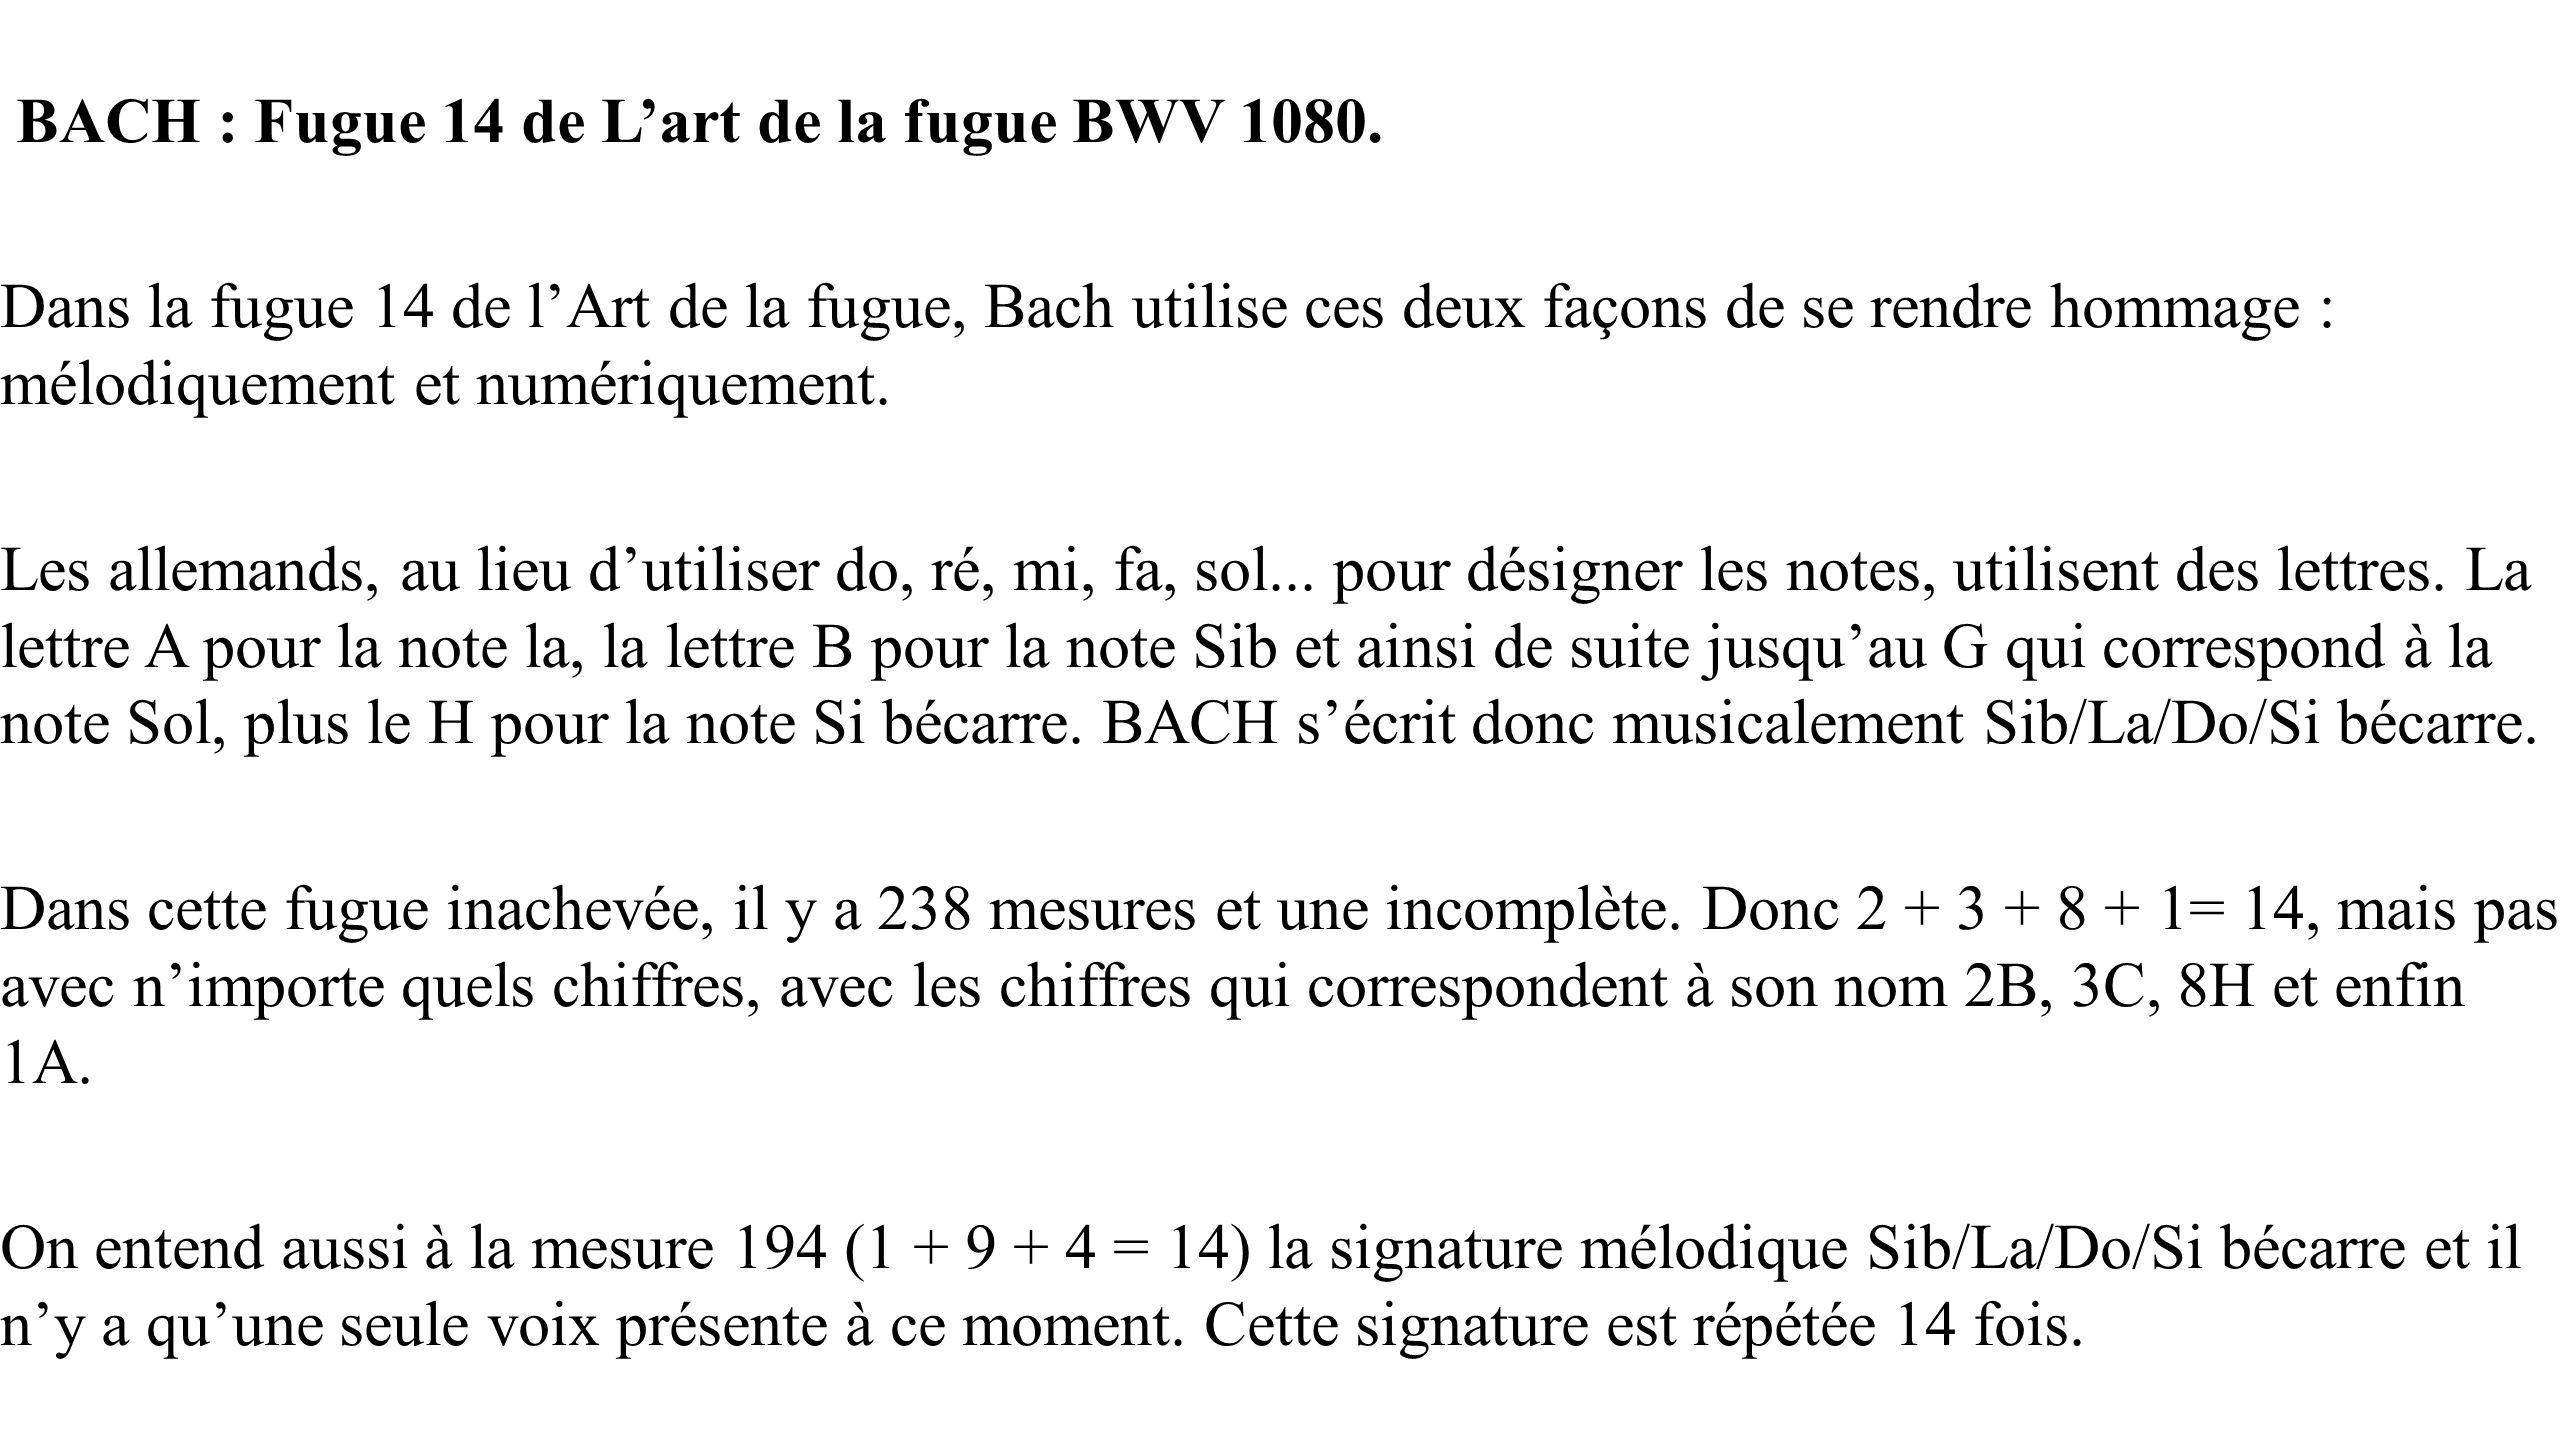 BACH : Fugue 14 de Lart de la fugue BWV 1080. Dans la fugue 14 de lArt de la fugue, Bach utilise ces deux façons de se rendre hommage : mélodiquement